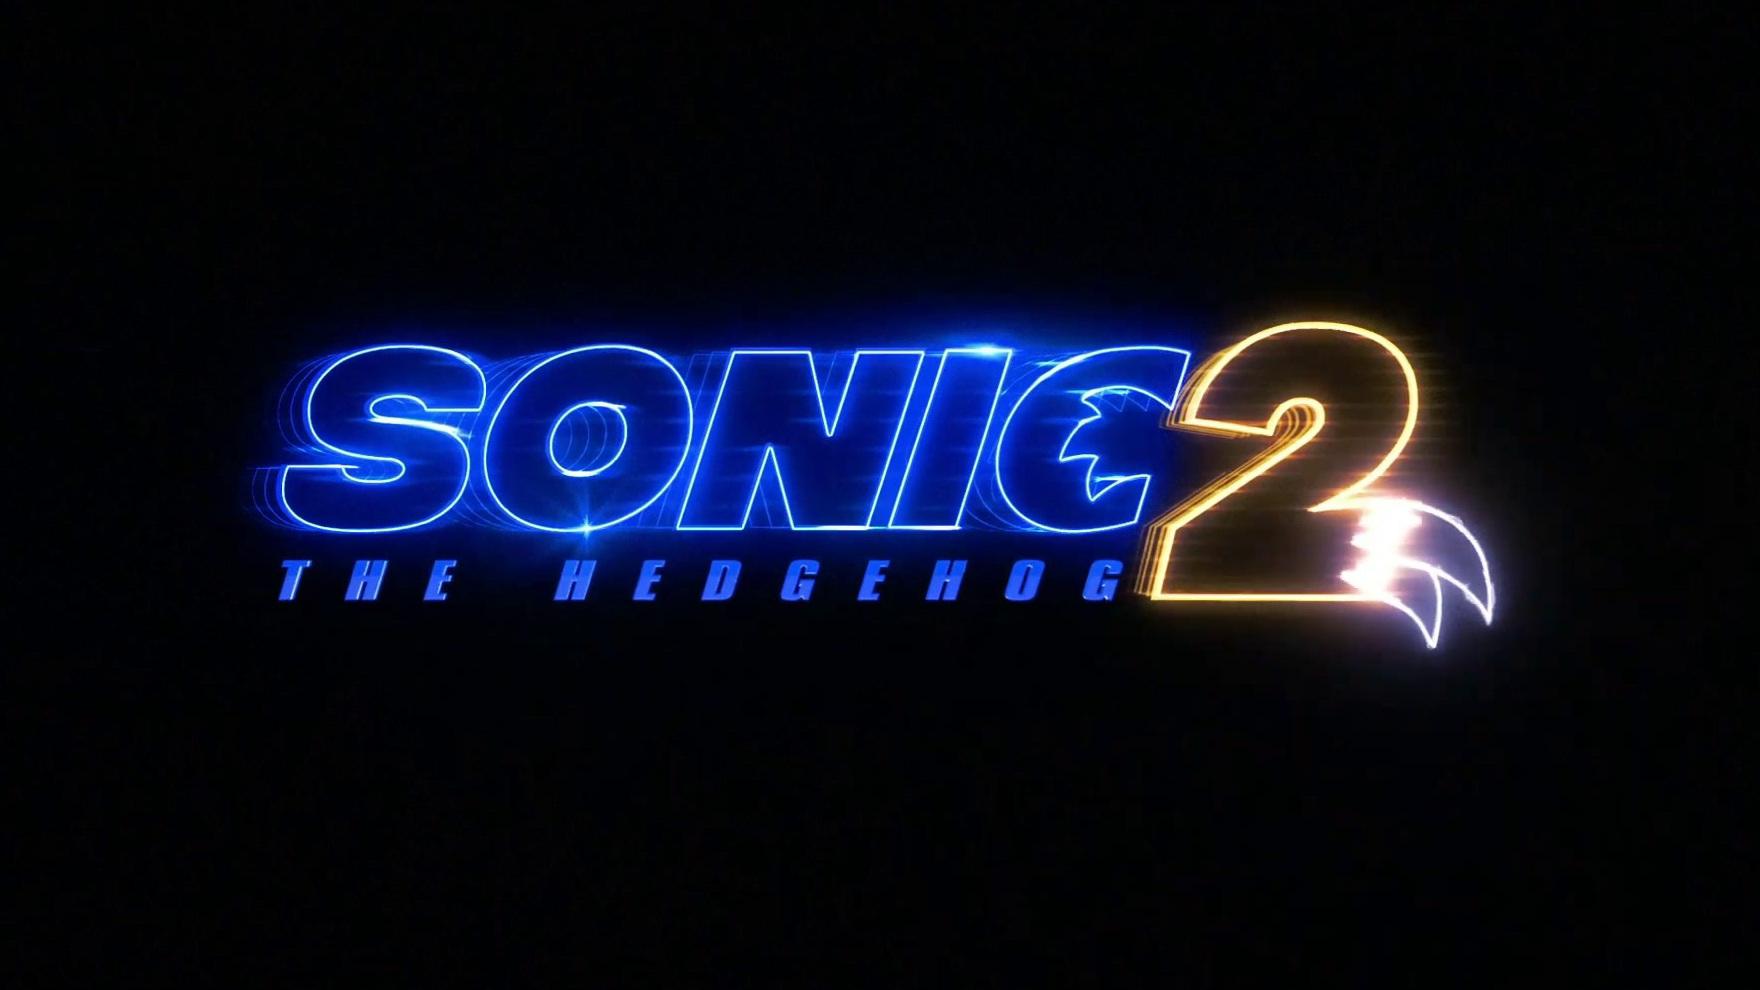 Sonic The Hedgehog 2 (Australia Title Announcement)